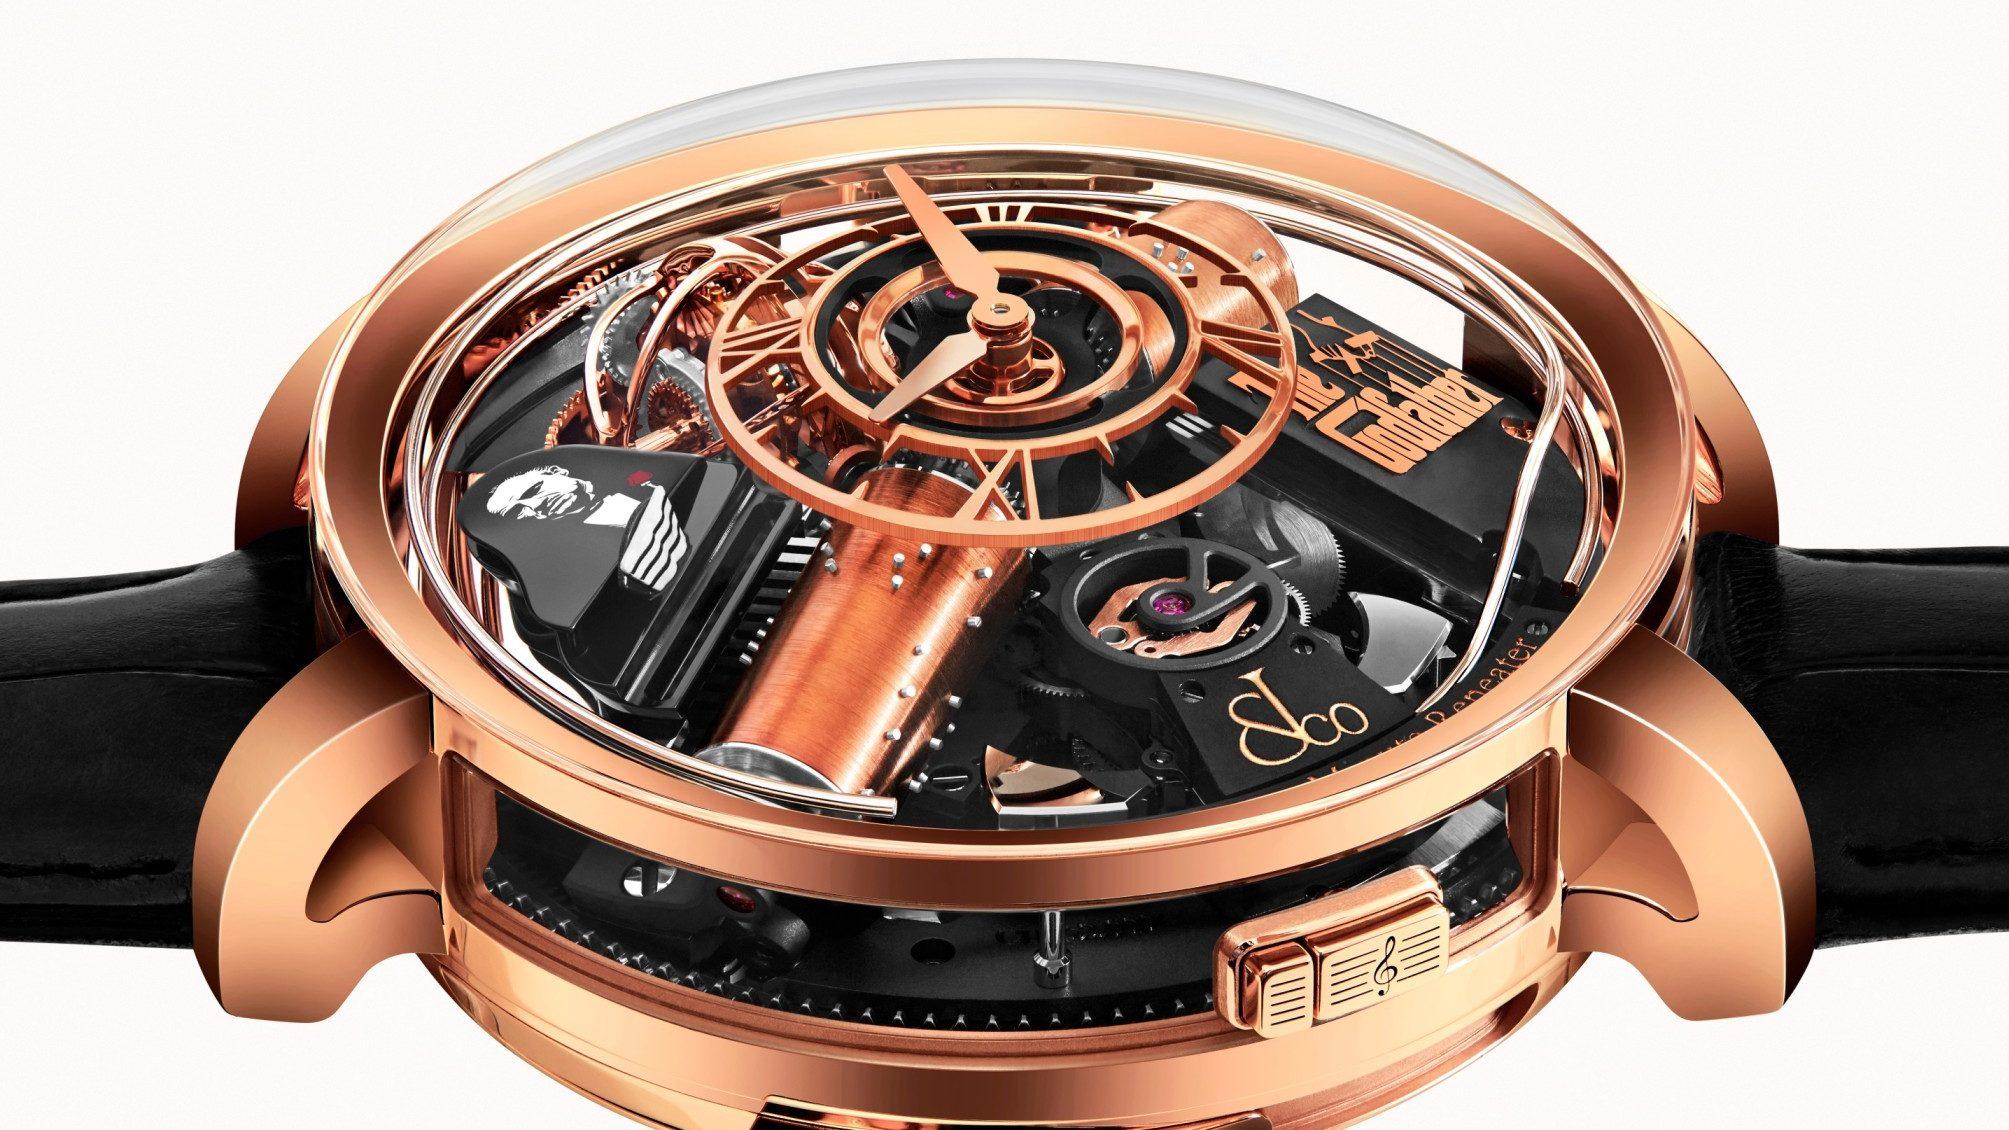 La música de 'El Padrino' resuena en este reloj de Jacob & Co